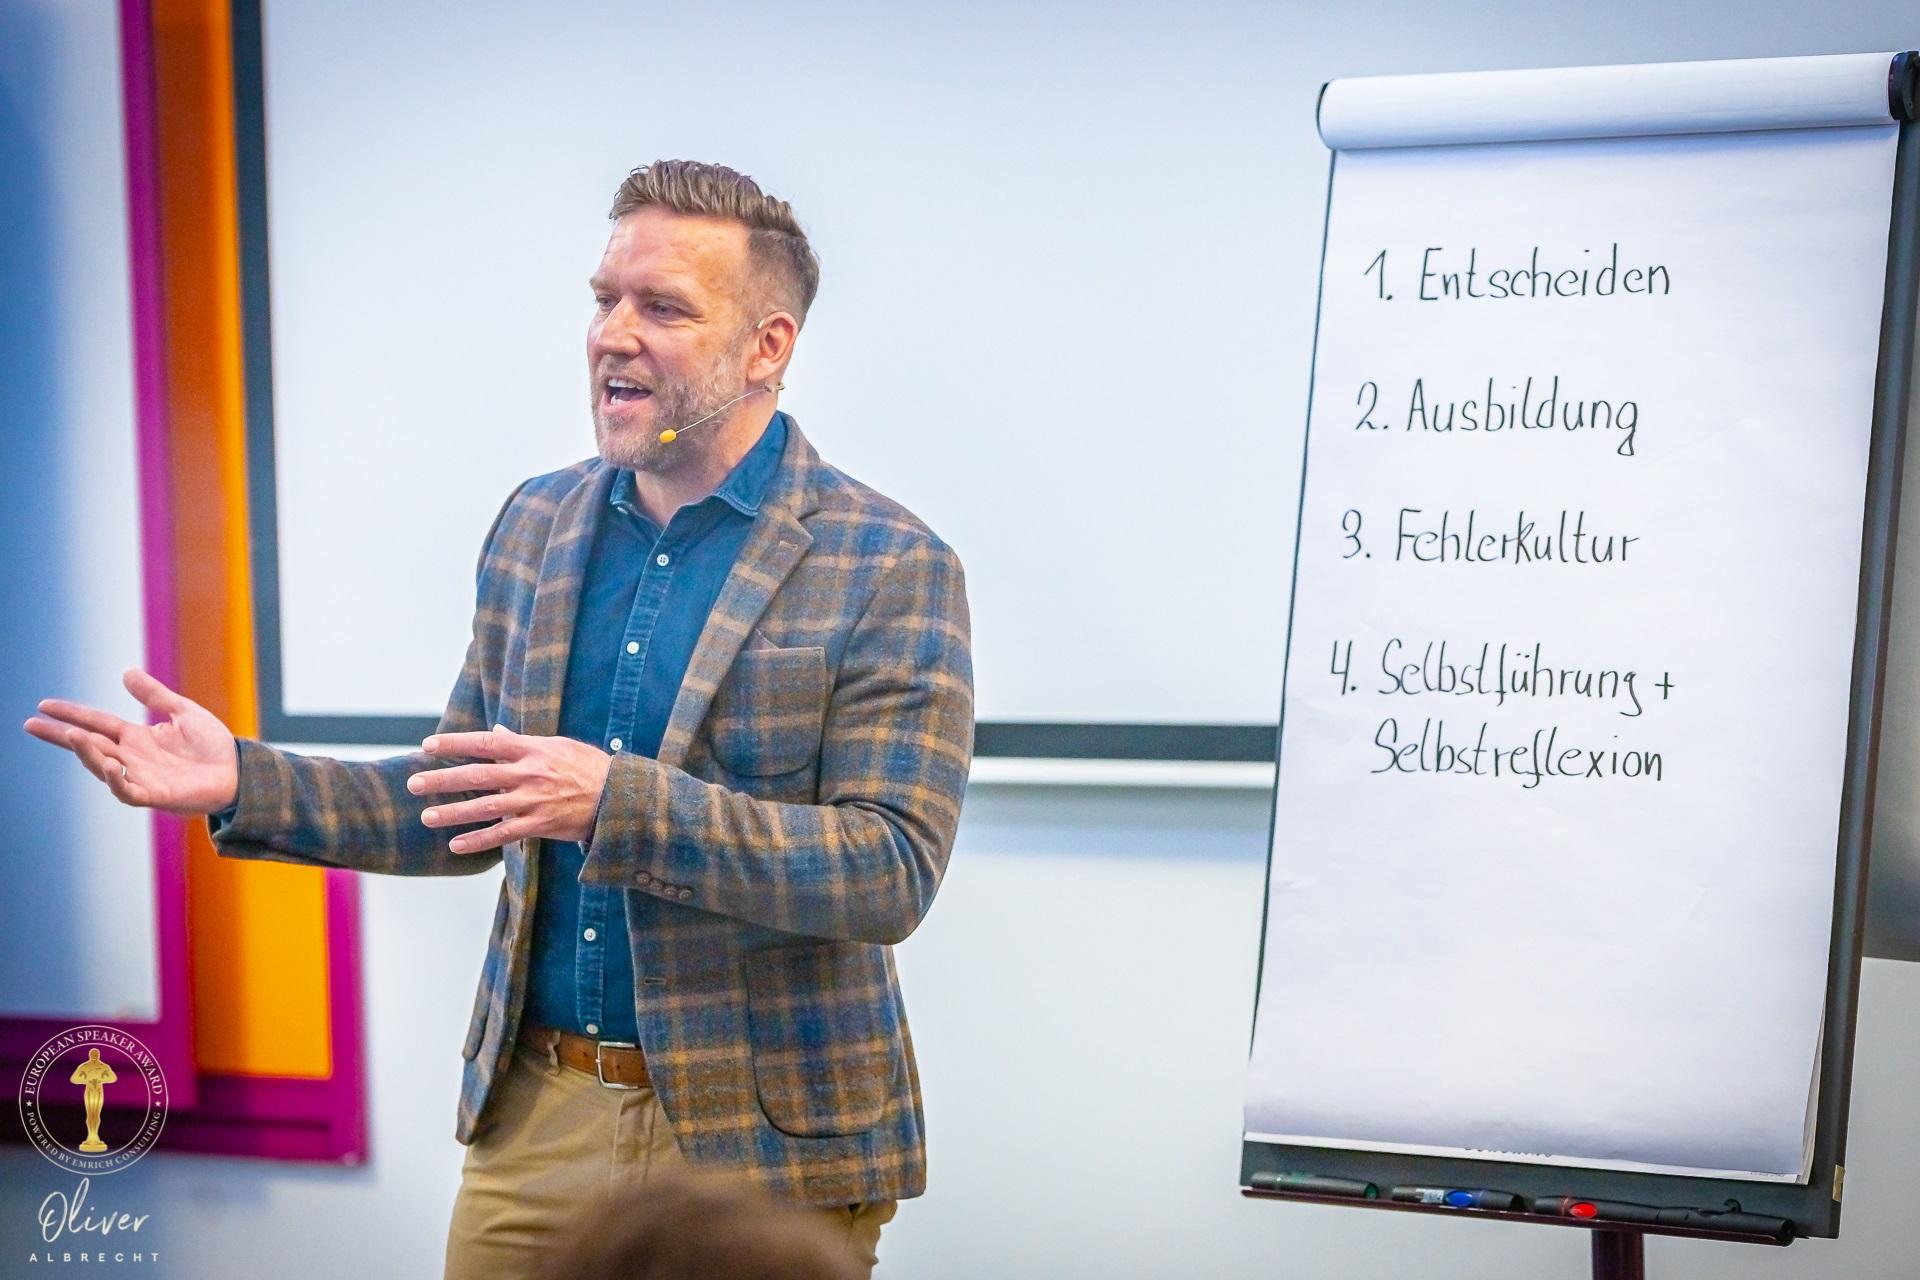 Expert Marketplace -  Egmont Roozenbeek - Impressionen zwei